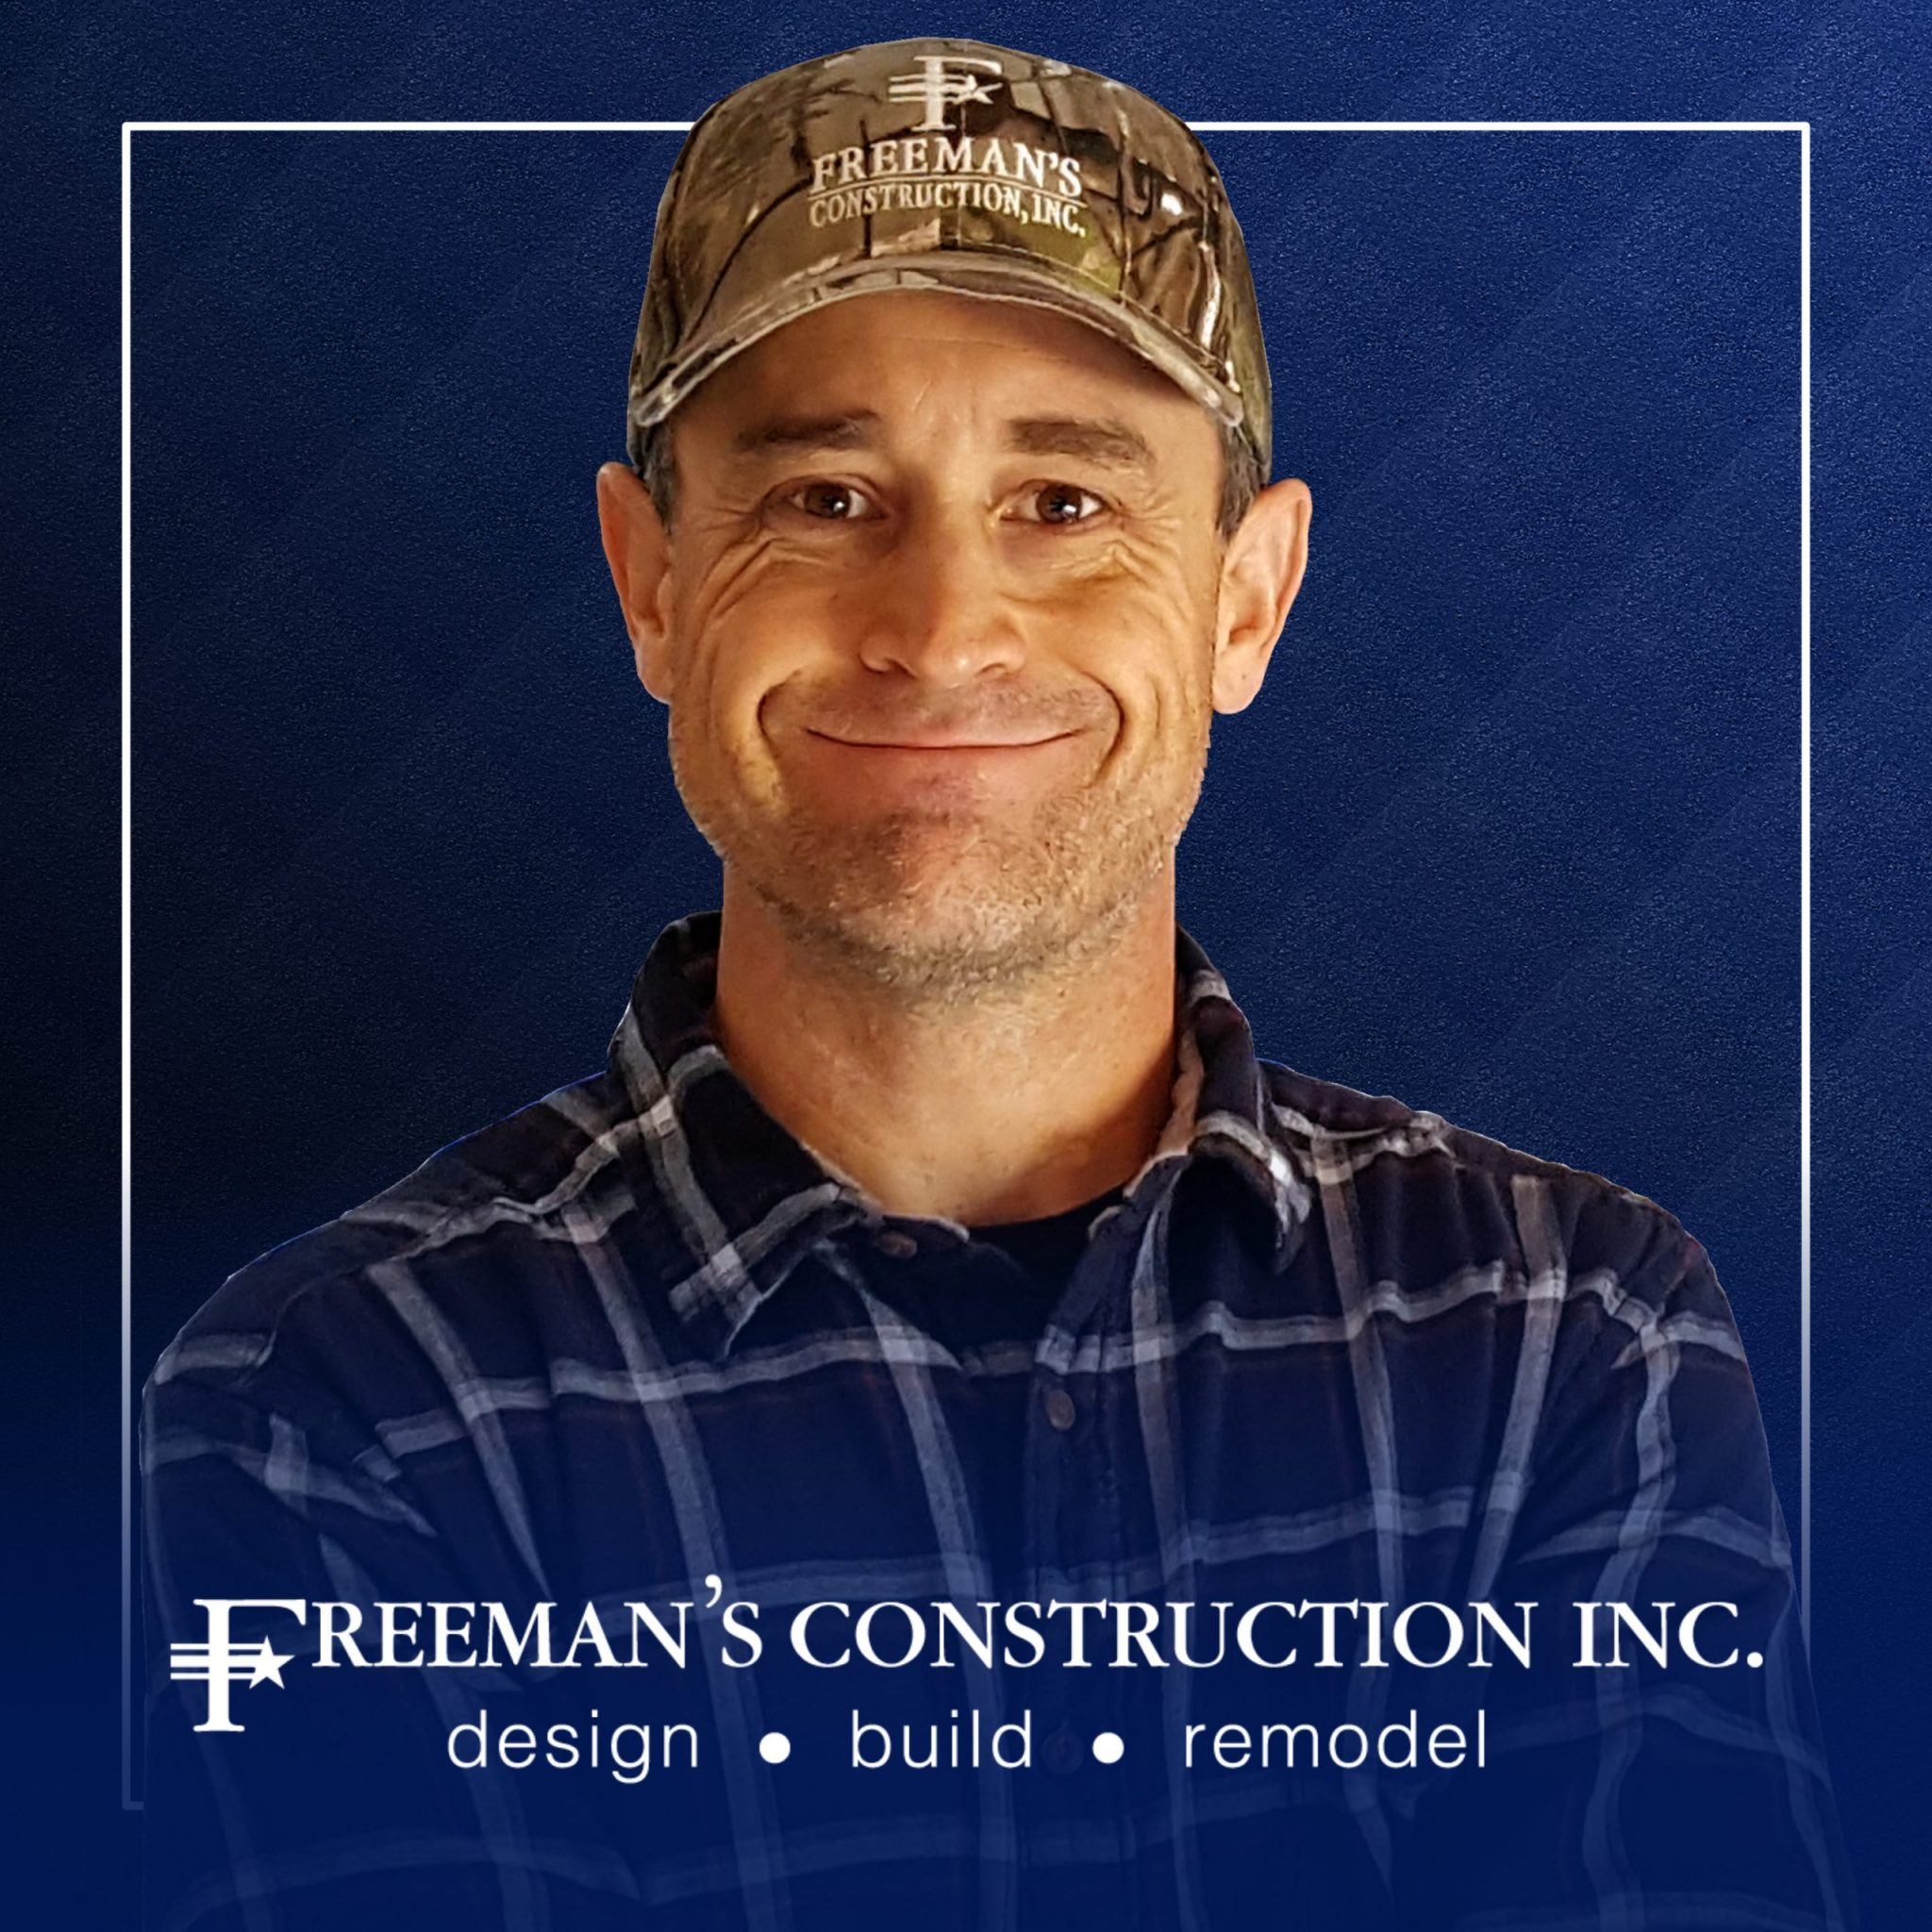 freemans-construction-inc-podcast